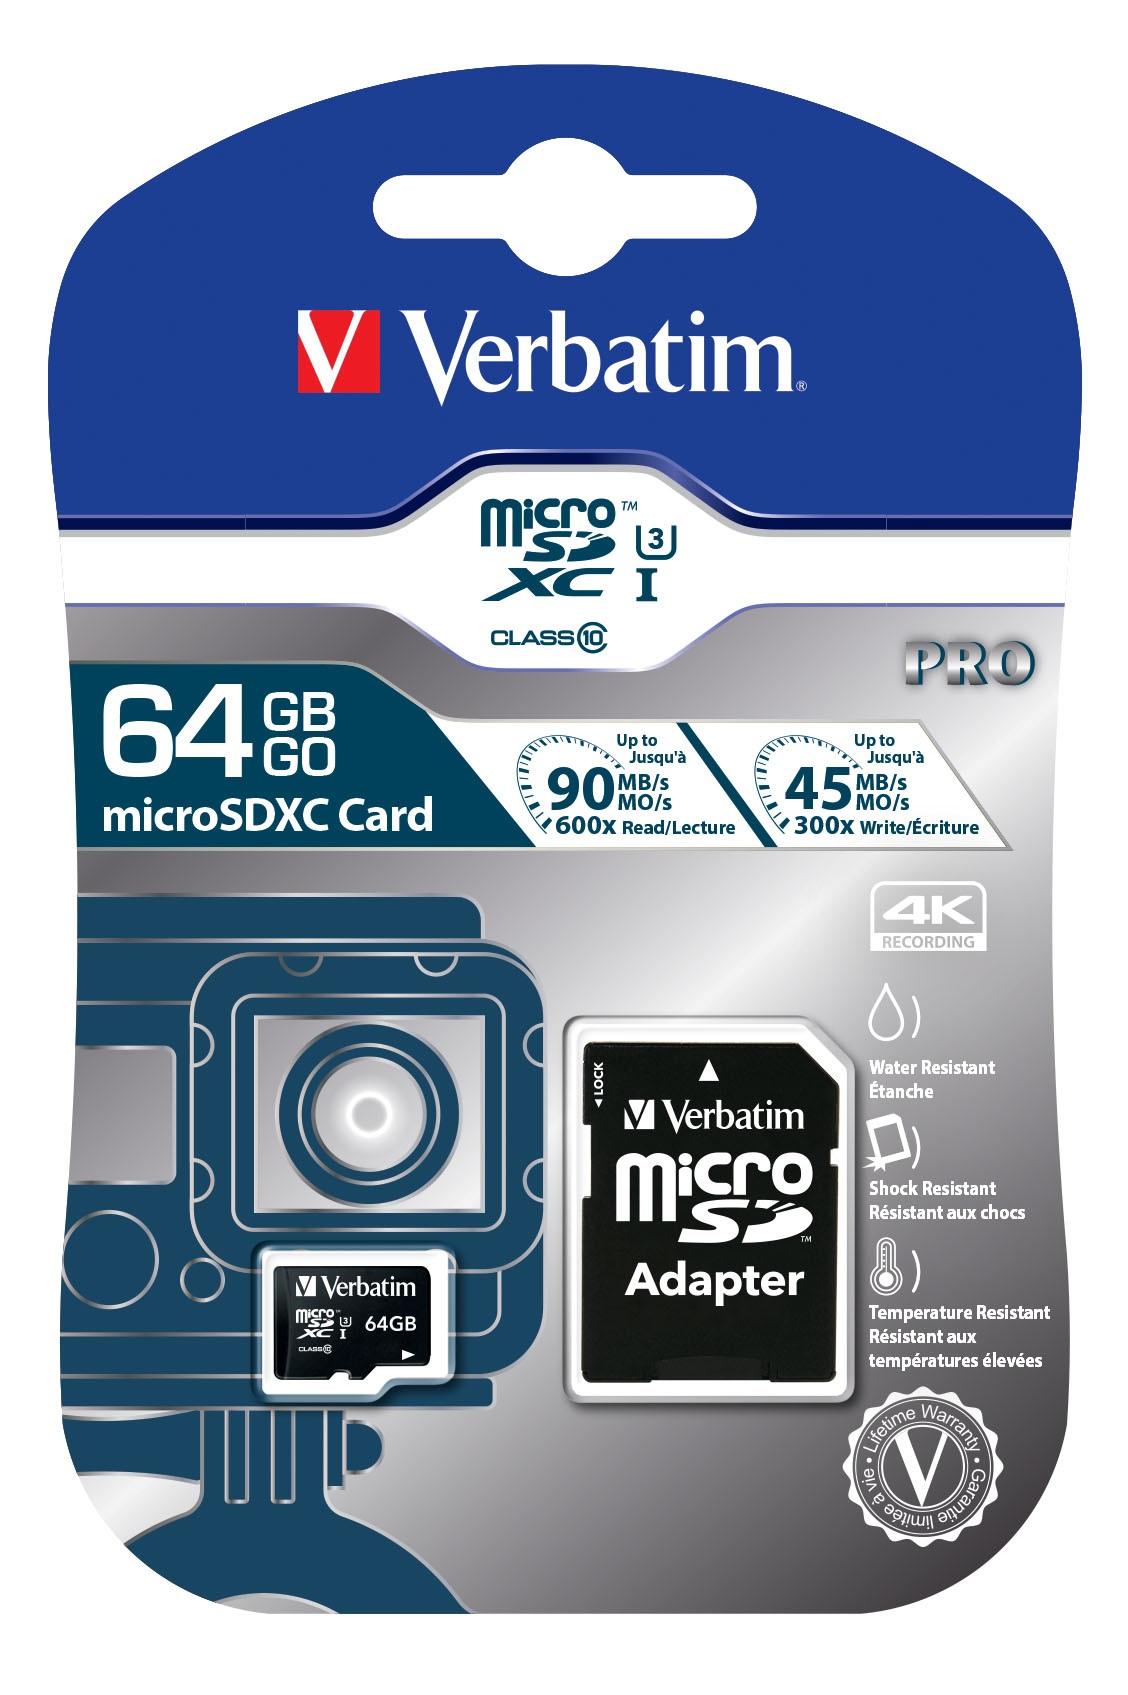 Verbatim Pro memory card 64 GB MicroSDXC Class 10 UHS